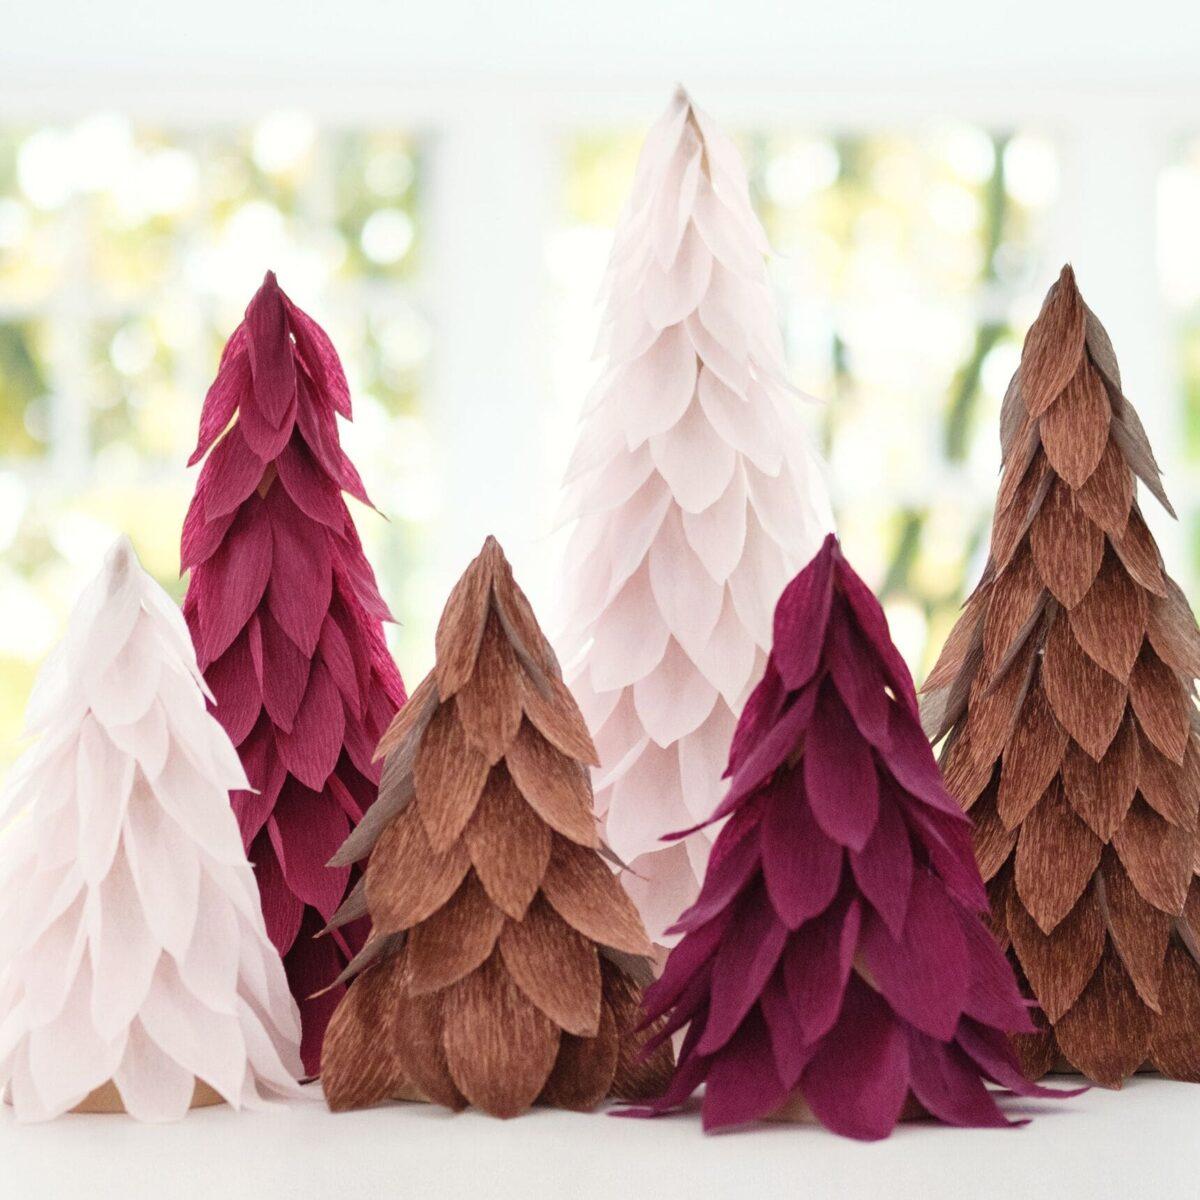 decorazioni-natalizie-carta-crespa-3